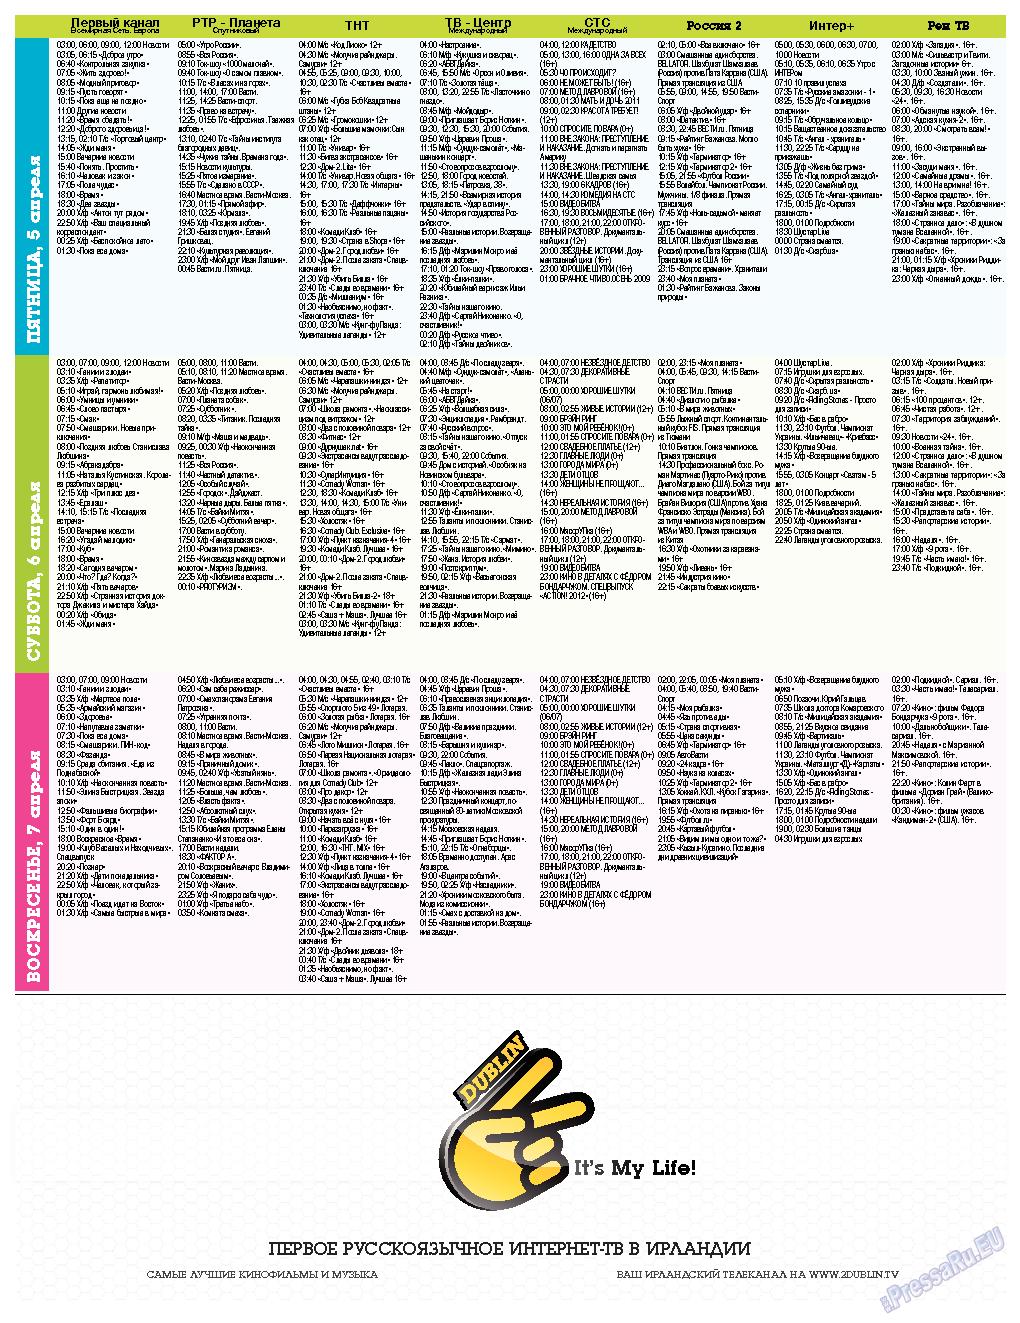 Дублин инфоцентр (газета). 2013 год, номер 12, стр. 9